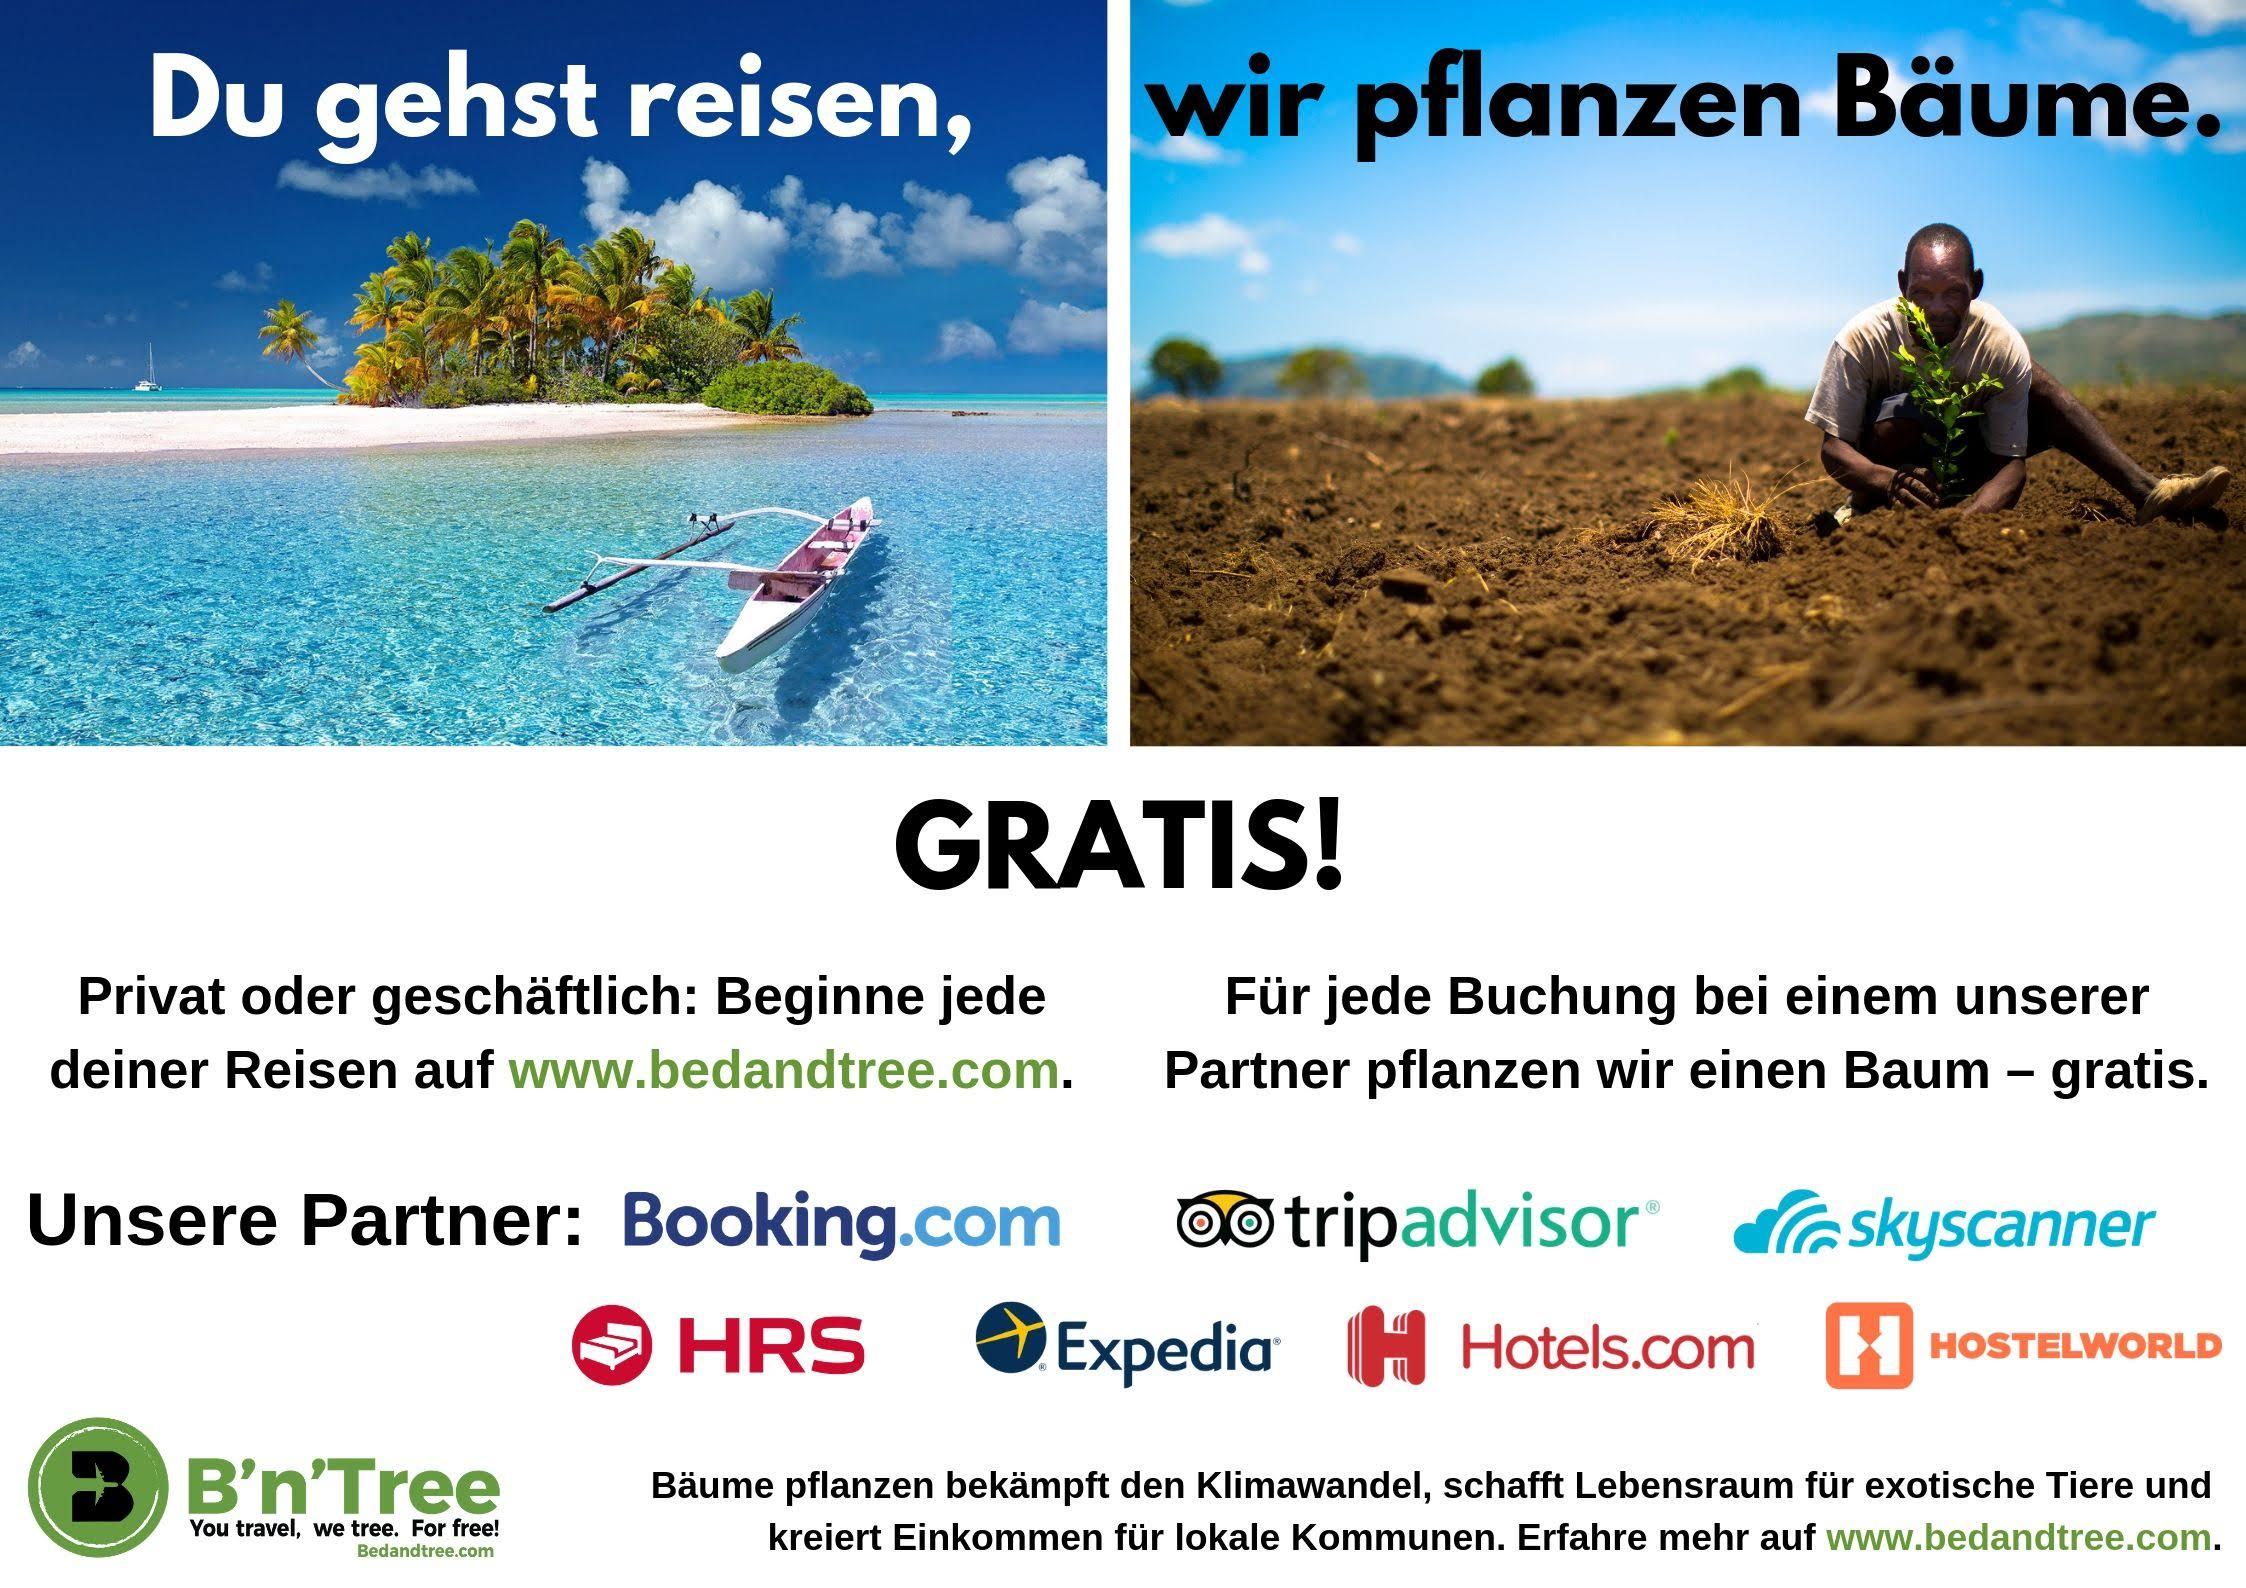 1903 Poster BnTree Landscape GER - Startups rund um den Bodensee